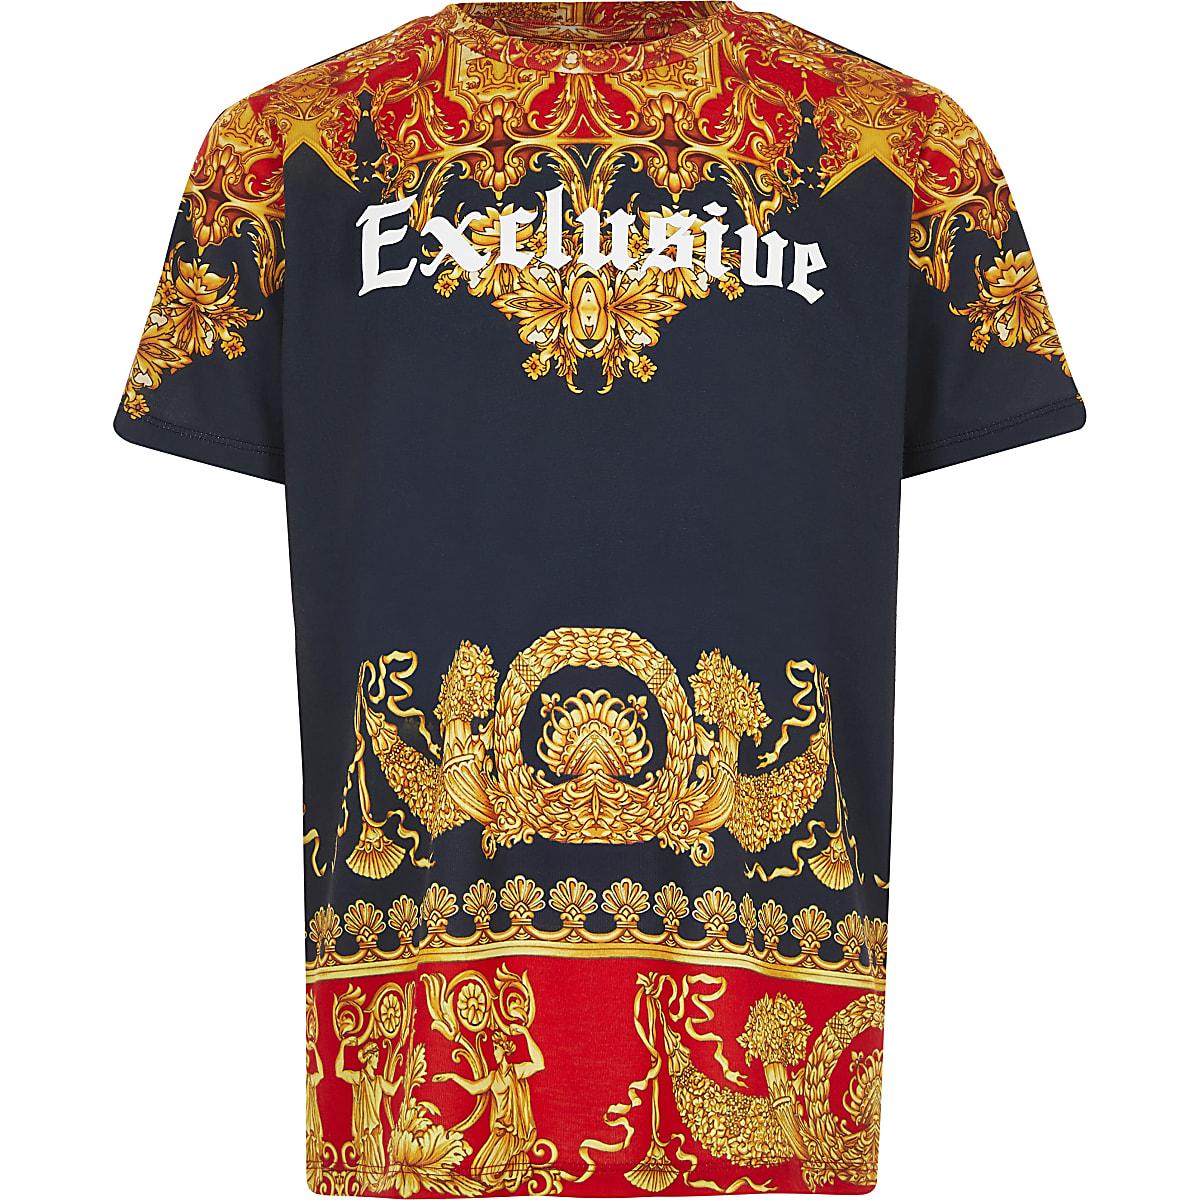 T-shirt baroque « Exclusive » bleu marine pour garçon